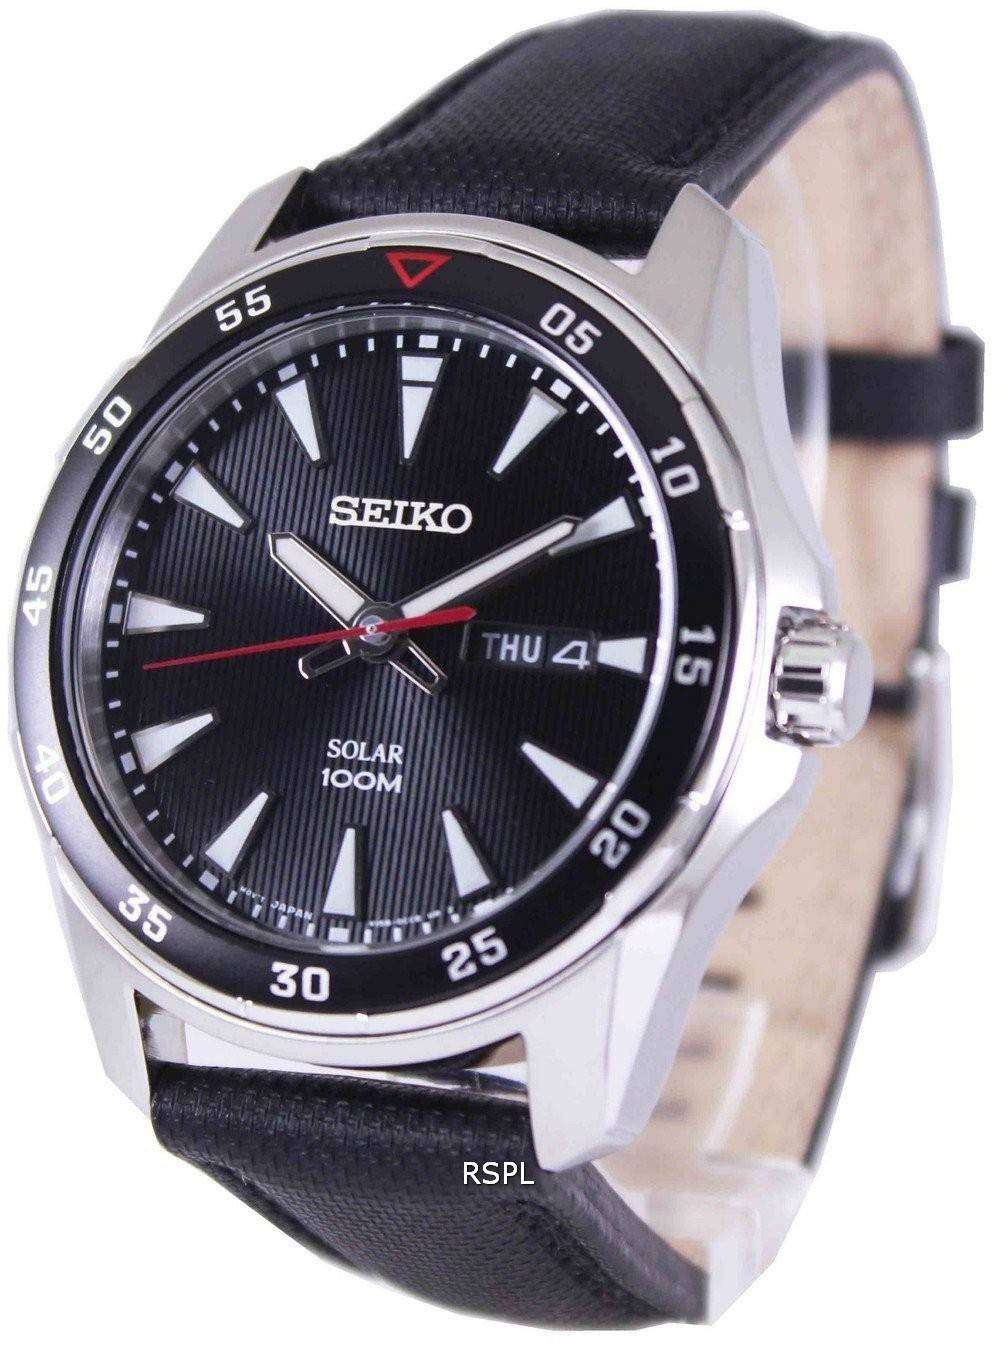 Seiko solar 100m sne393p2 mens watch downunderwatches for Seiko solar